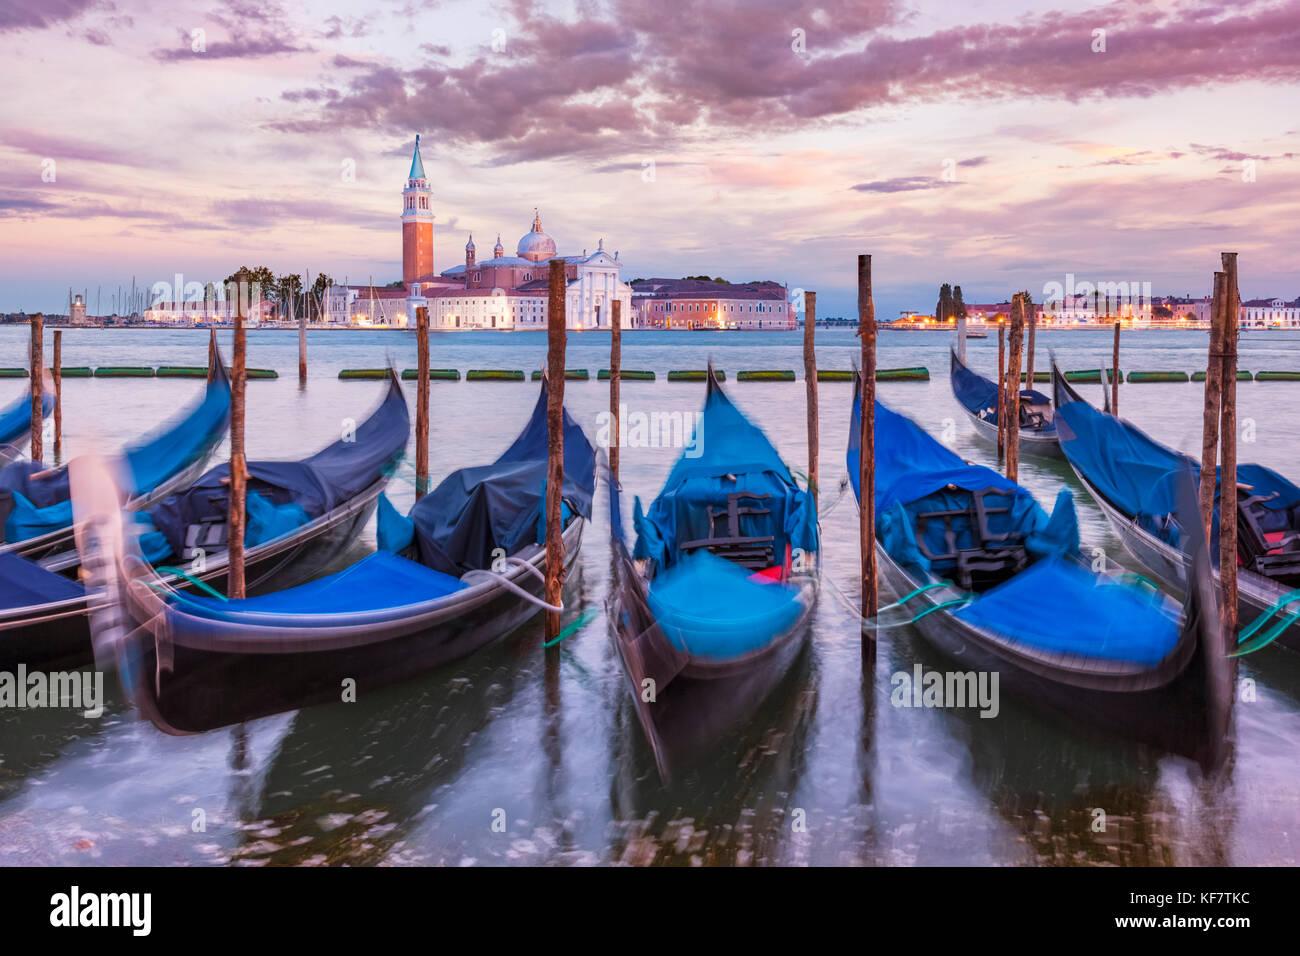 Gondeln Italien Venedig Italien günstig Gondeln auf dem Canal Grande Venedig gegenüber der Insel San Giorgio Stockbild